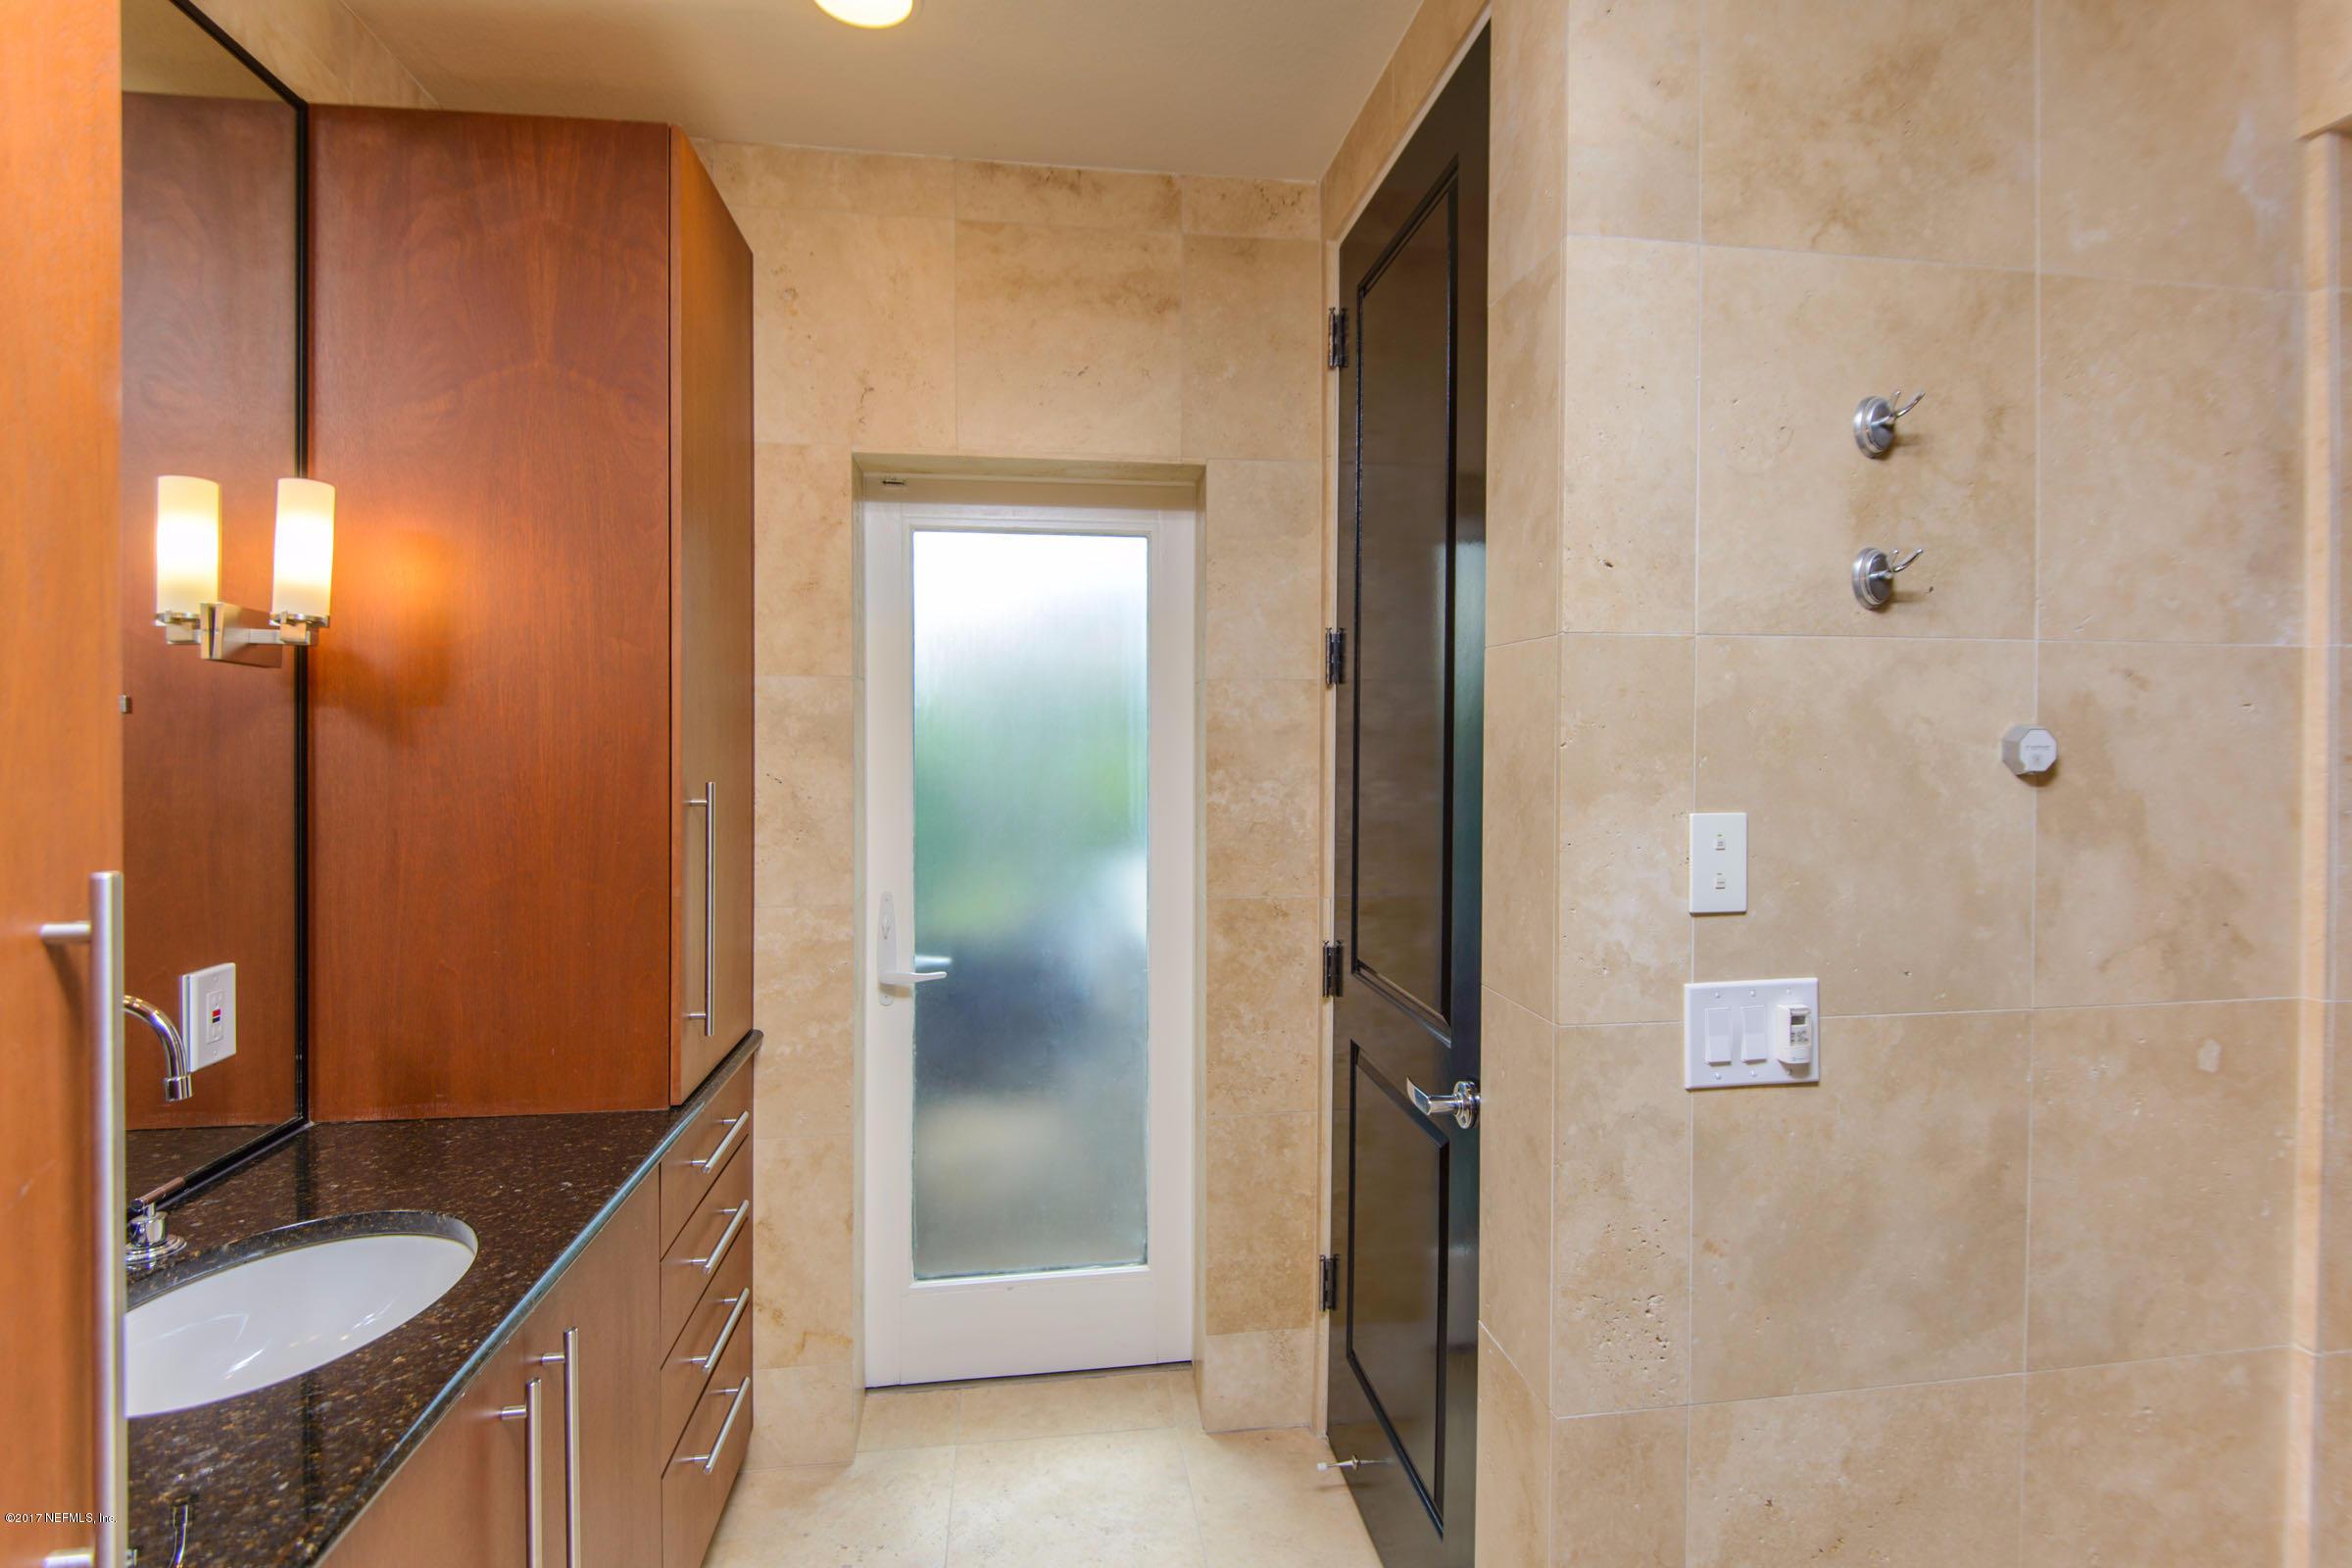 3 CAPRI, PALM COAST, FLORIDA 32137, 6 Bedrooms Bedrooms, ,7 BathroomsBathrooms,Residential - single family,For sale,CAPRI,917570